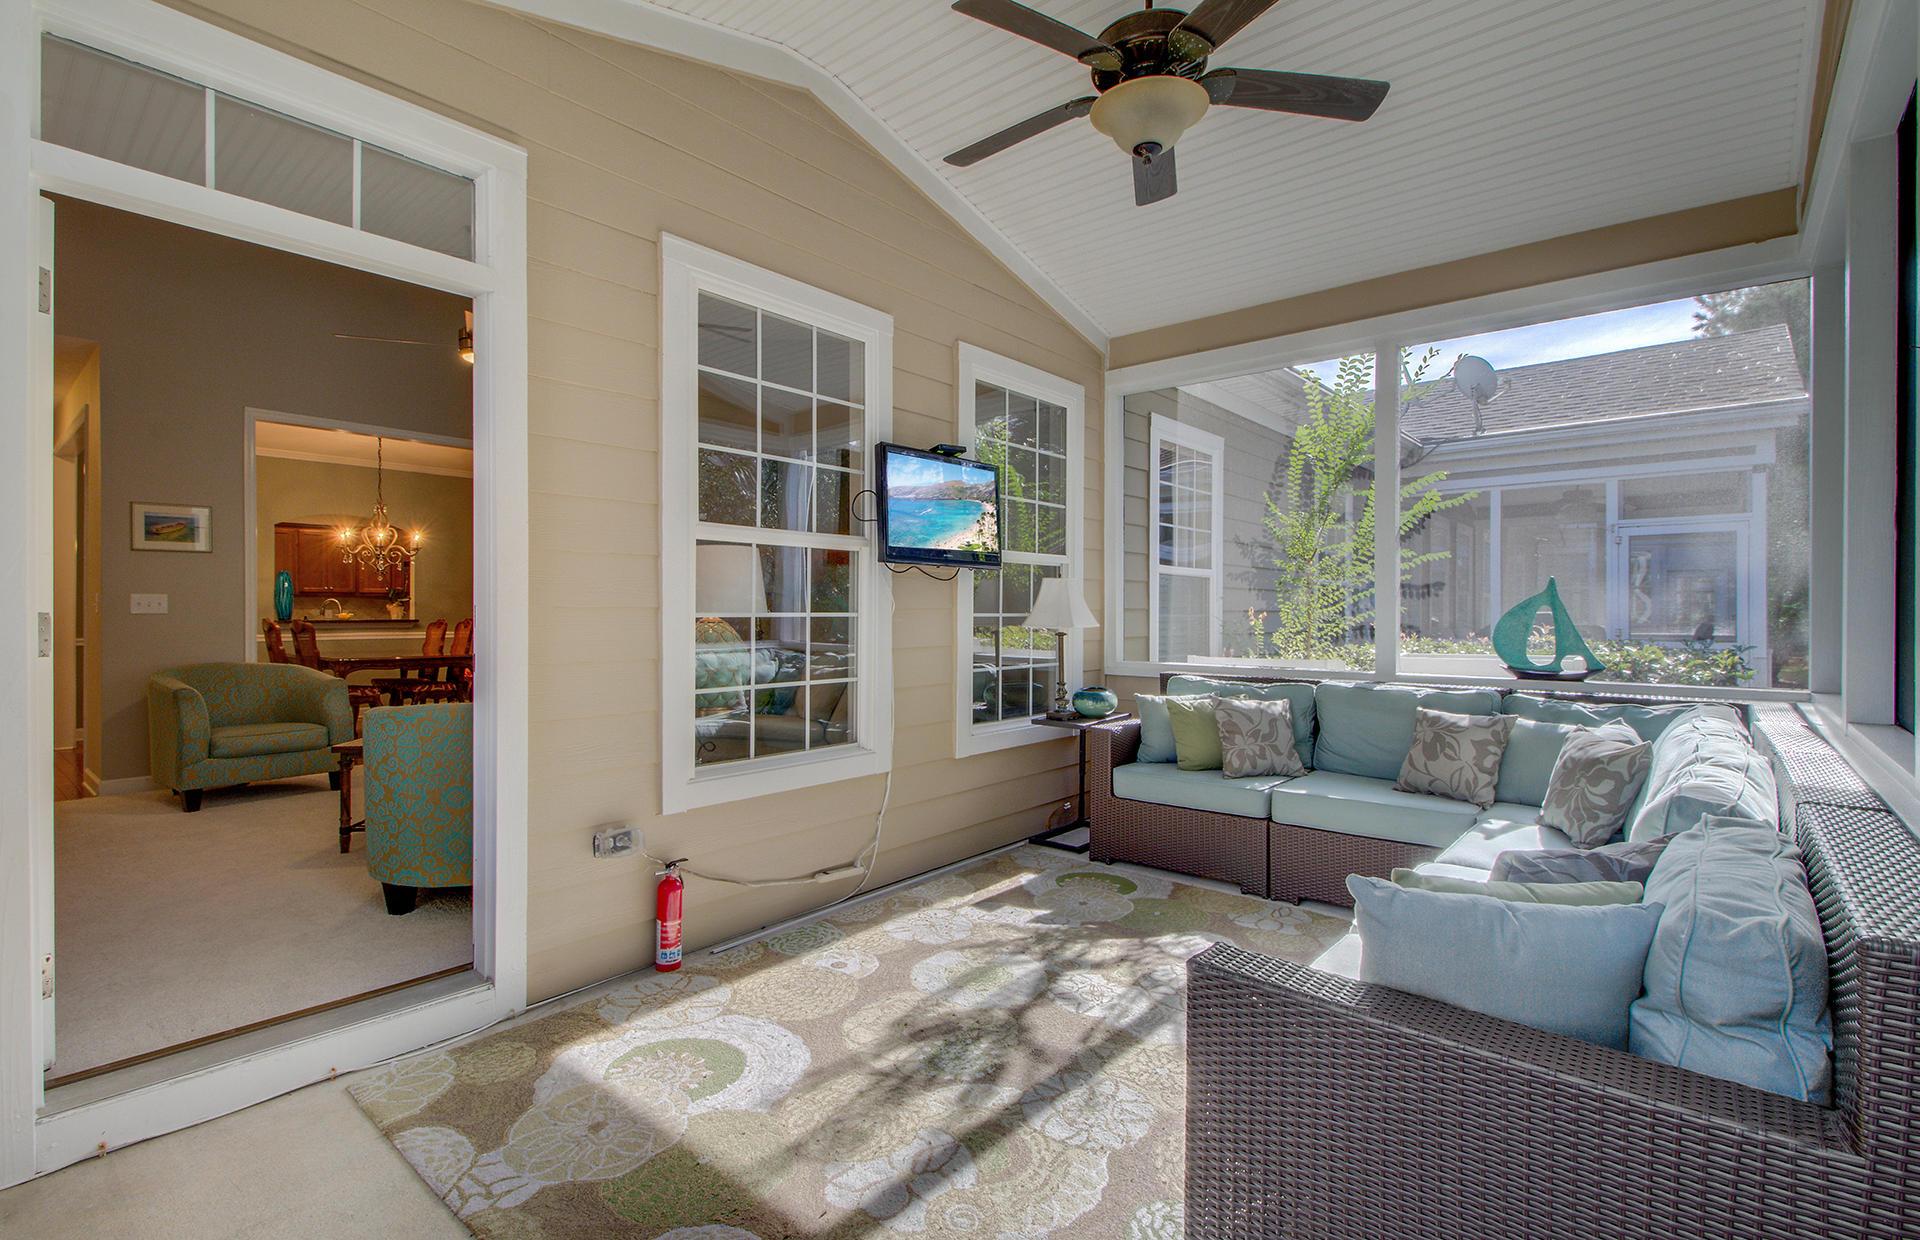 Dunes West Homes For Sale - 145 Fresh Meadow, Mount Pleasant, SC - 34